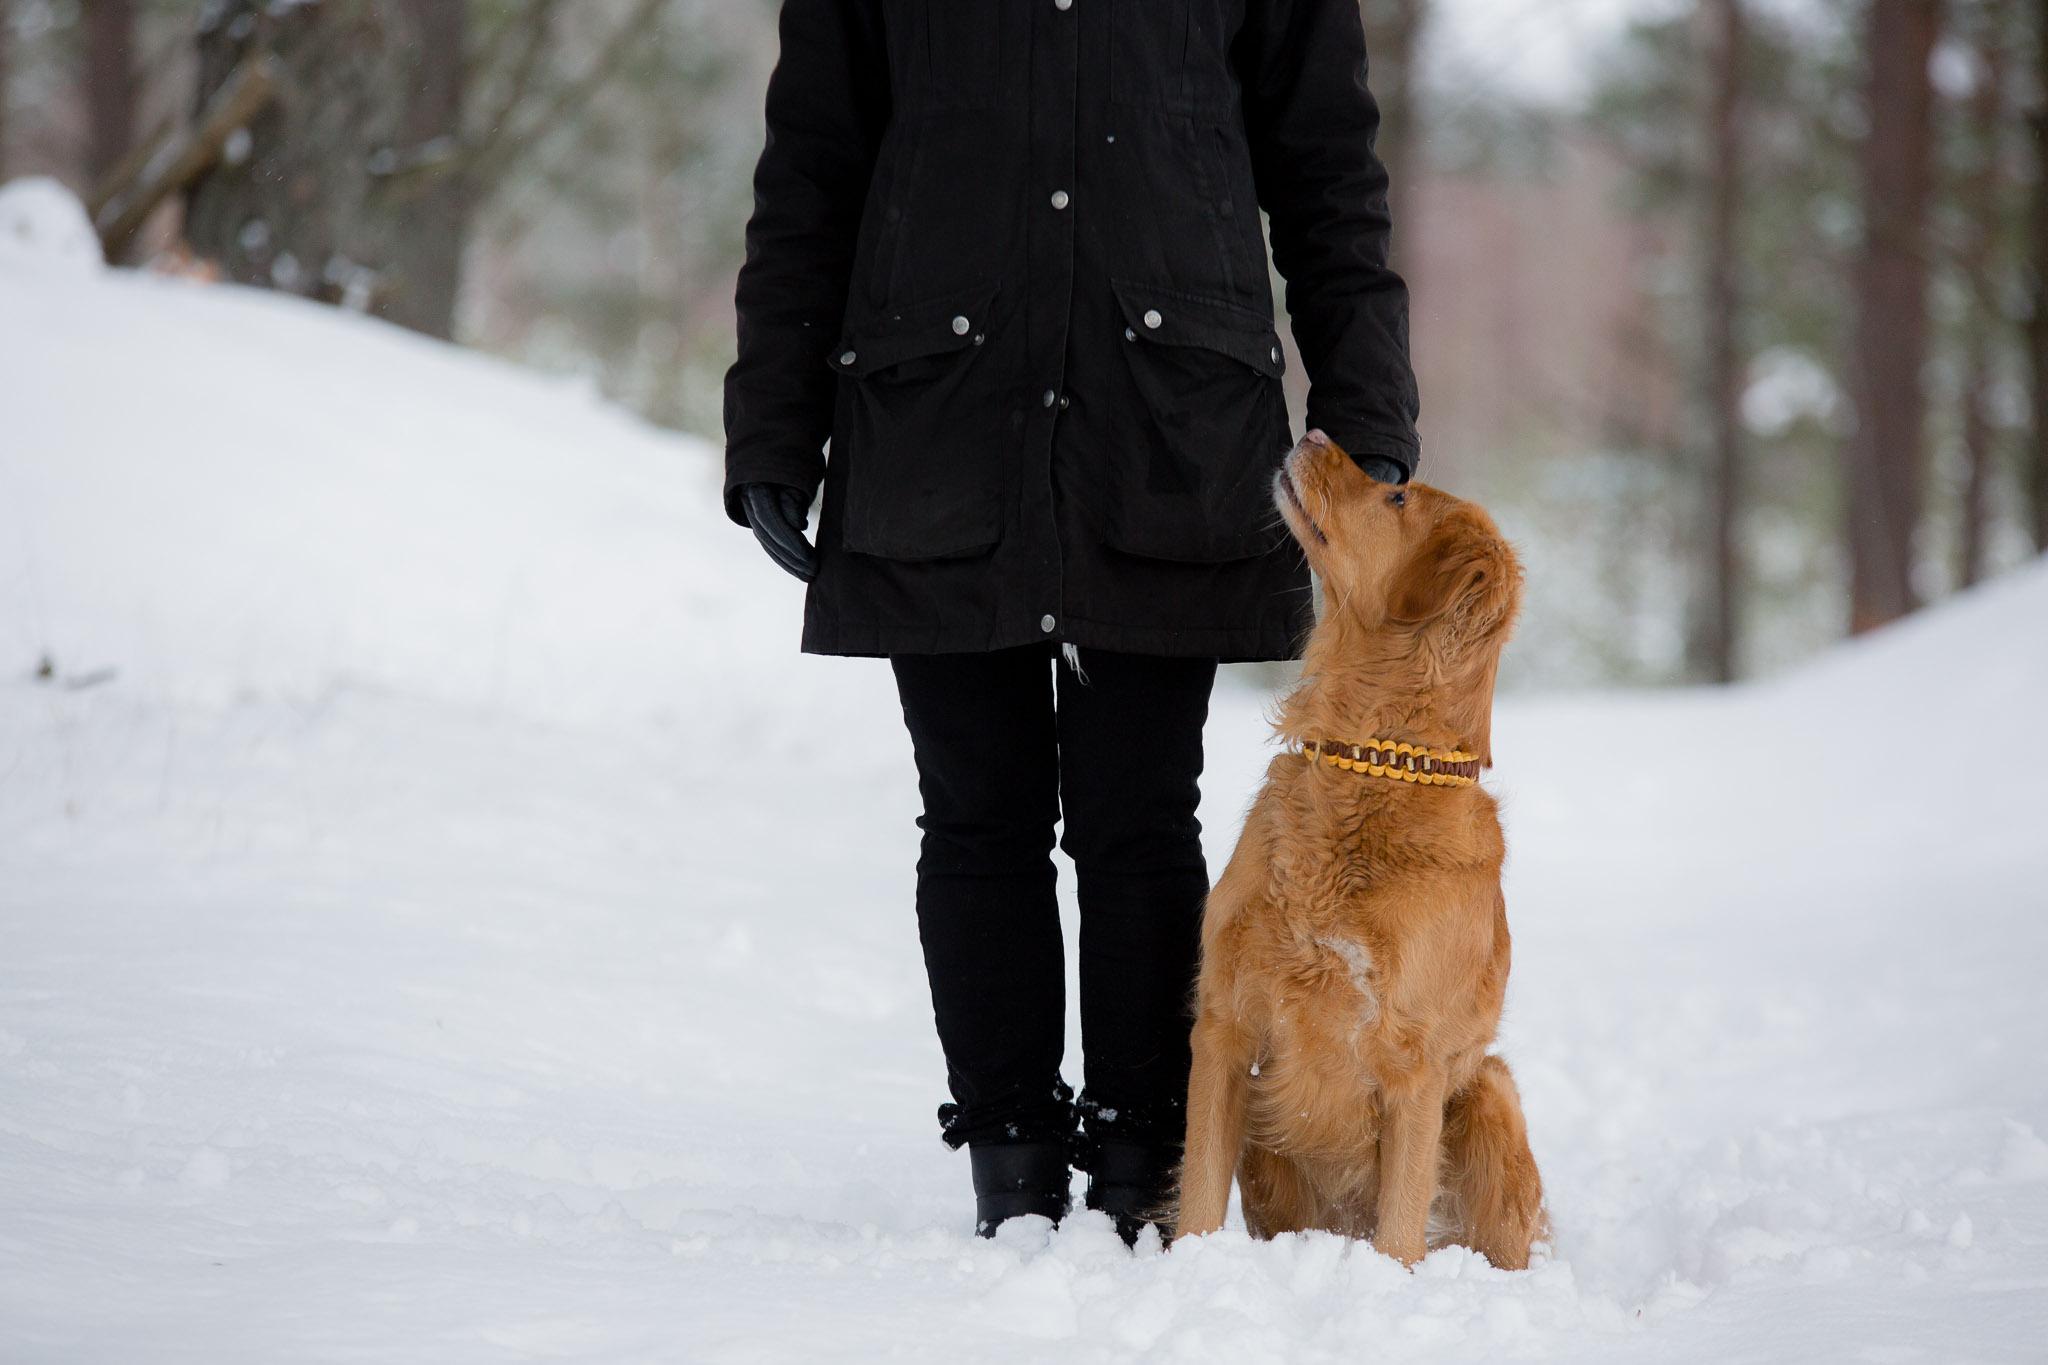 Annatarfoto hundfotografering Kallinge Ronneby golden retriever